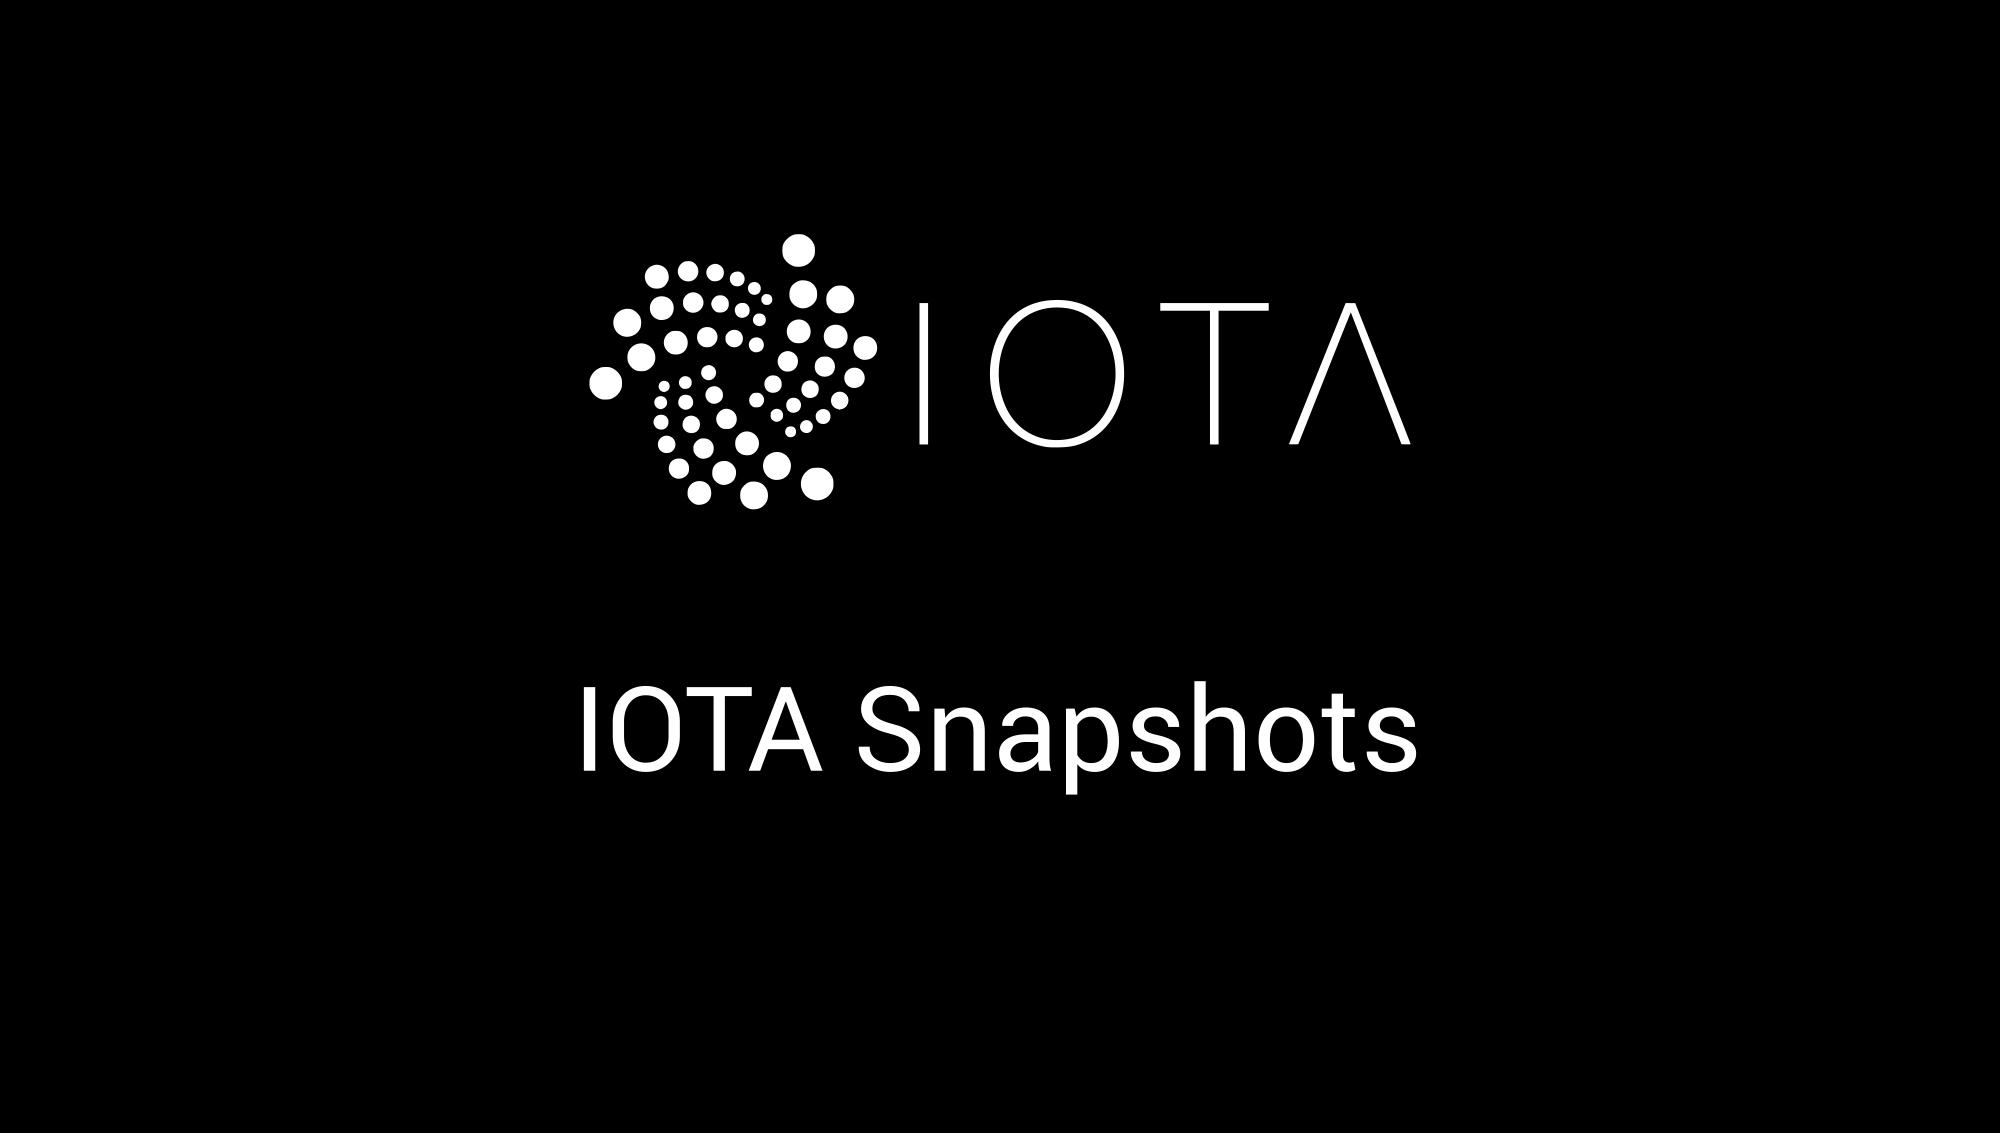 Implementation/docs/wp-content/uploads/2018/02/iota-snapshots.png